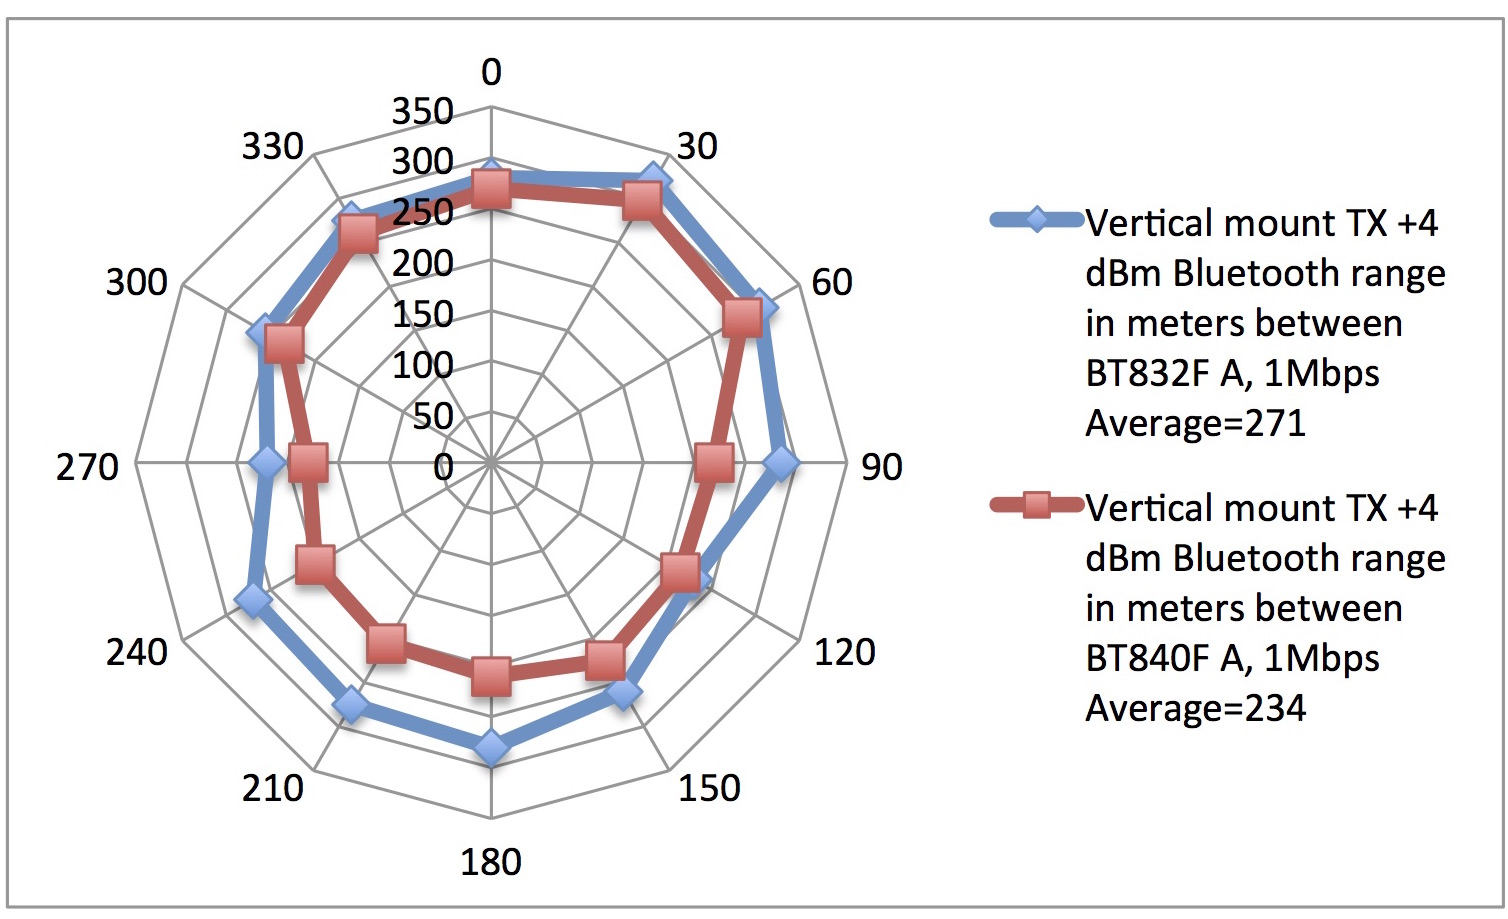 Measuring BT840F, an nRF52840 Bluetooth 5 Module Receiver